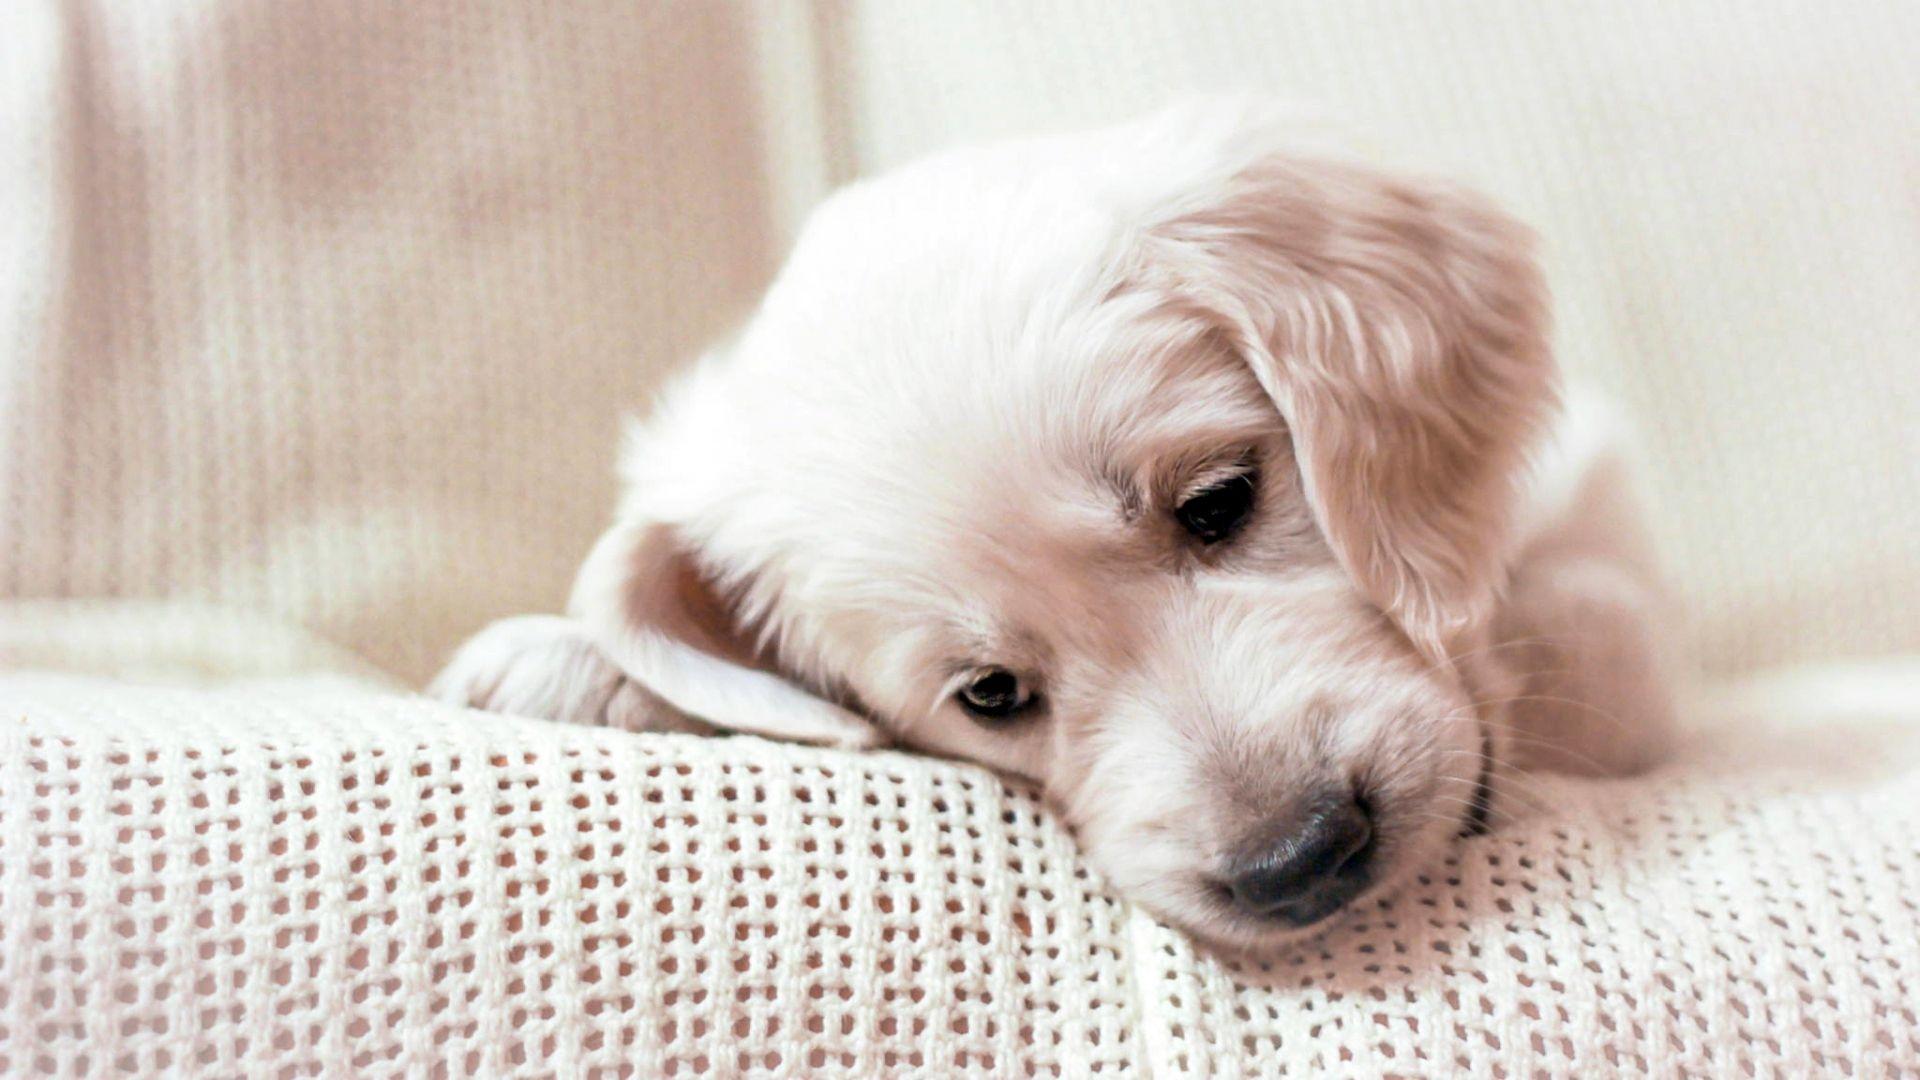 wallpaper of puppy